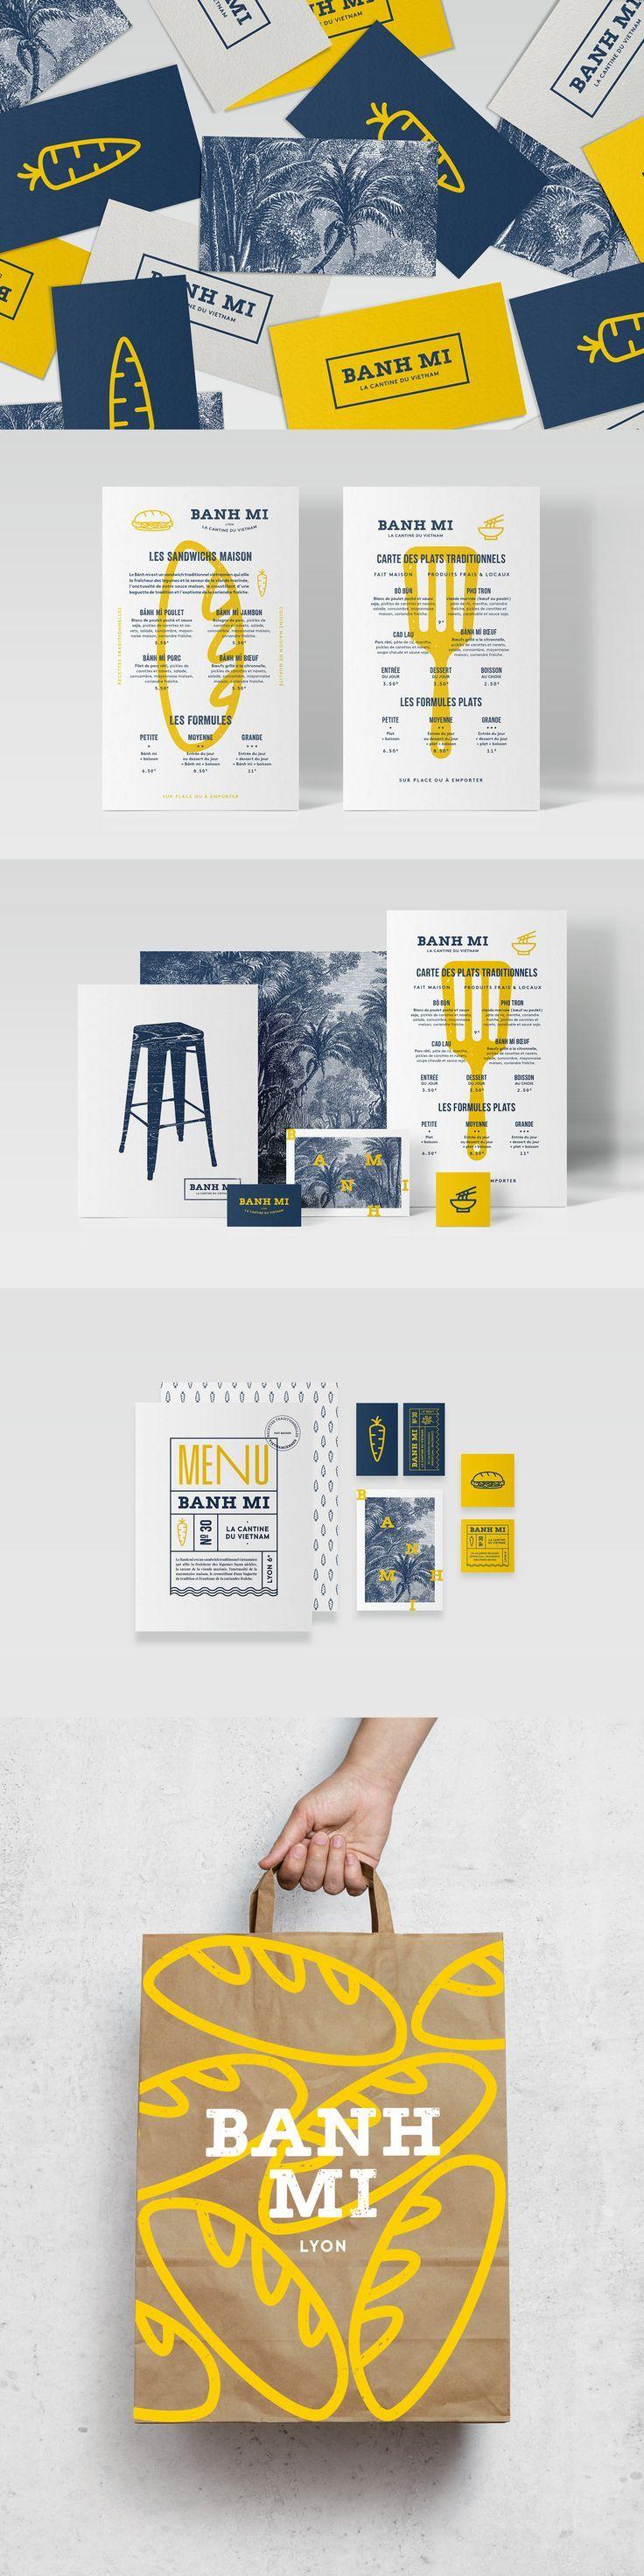 Banh Mi | Studio Cosmos | 2016 #food, #restaurant, #logo, #mockup, #vietnam, #graphic, #design, #menu, #france